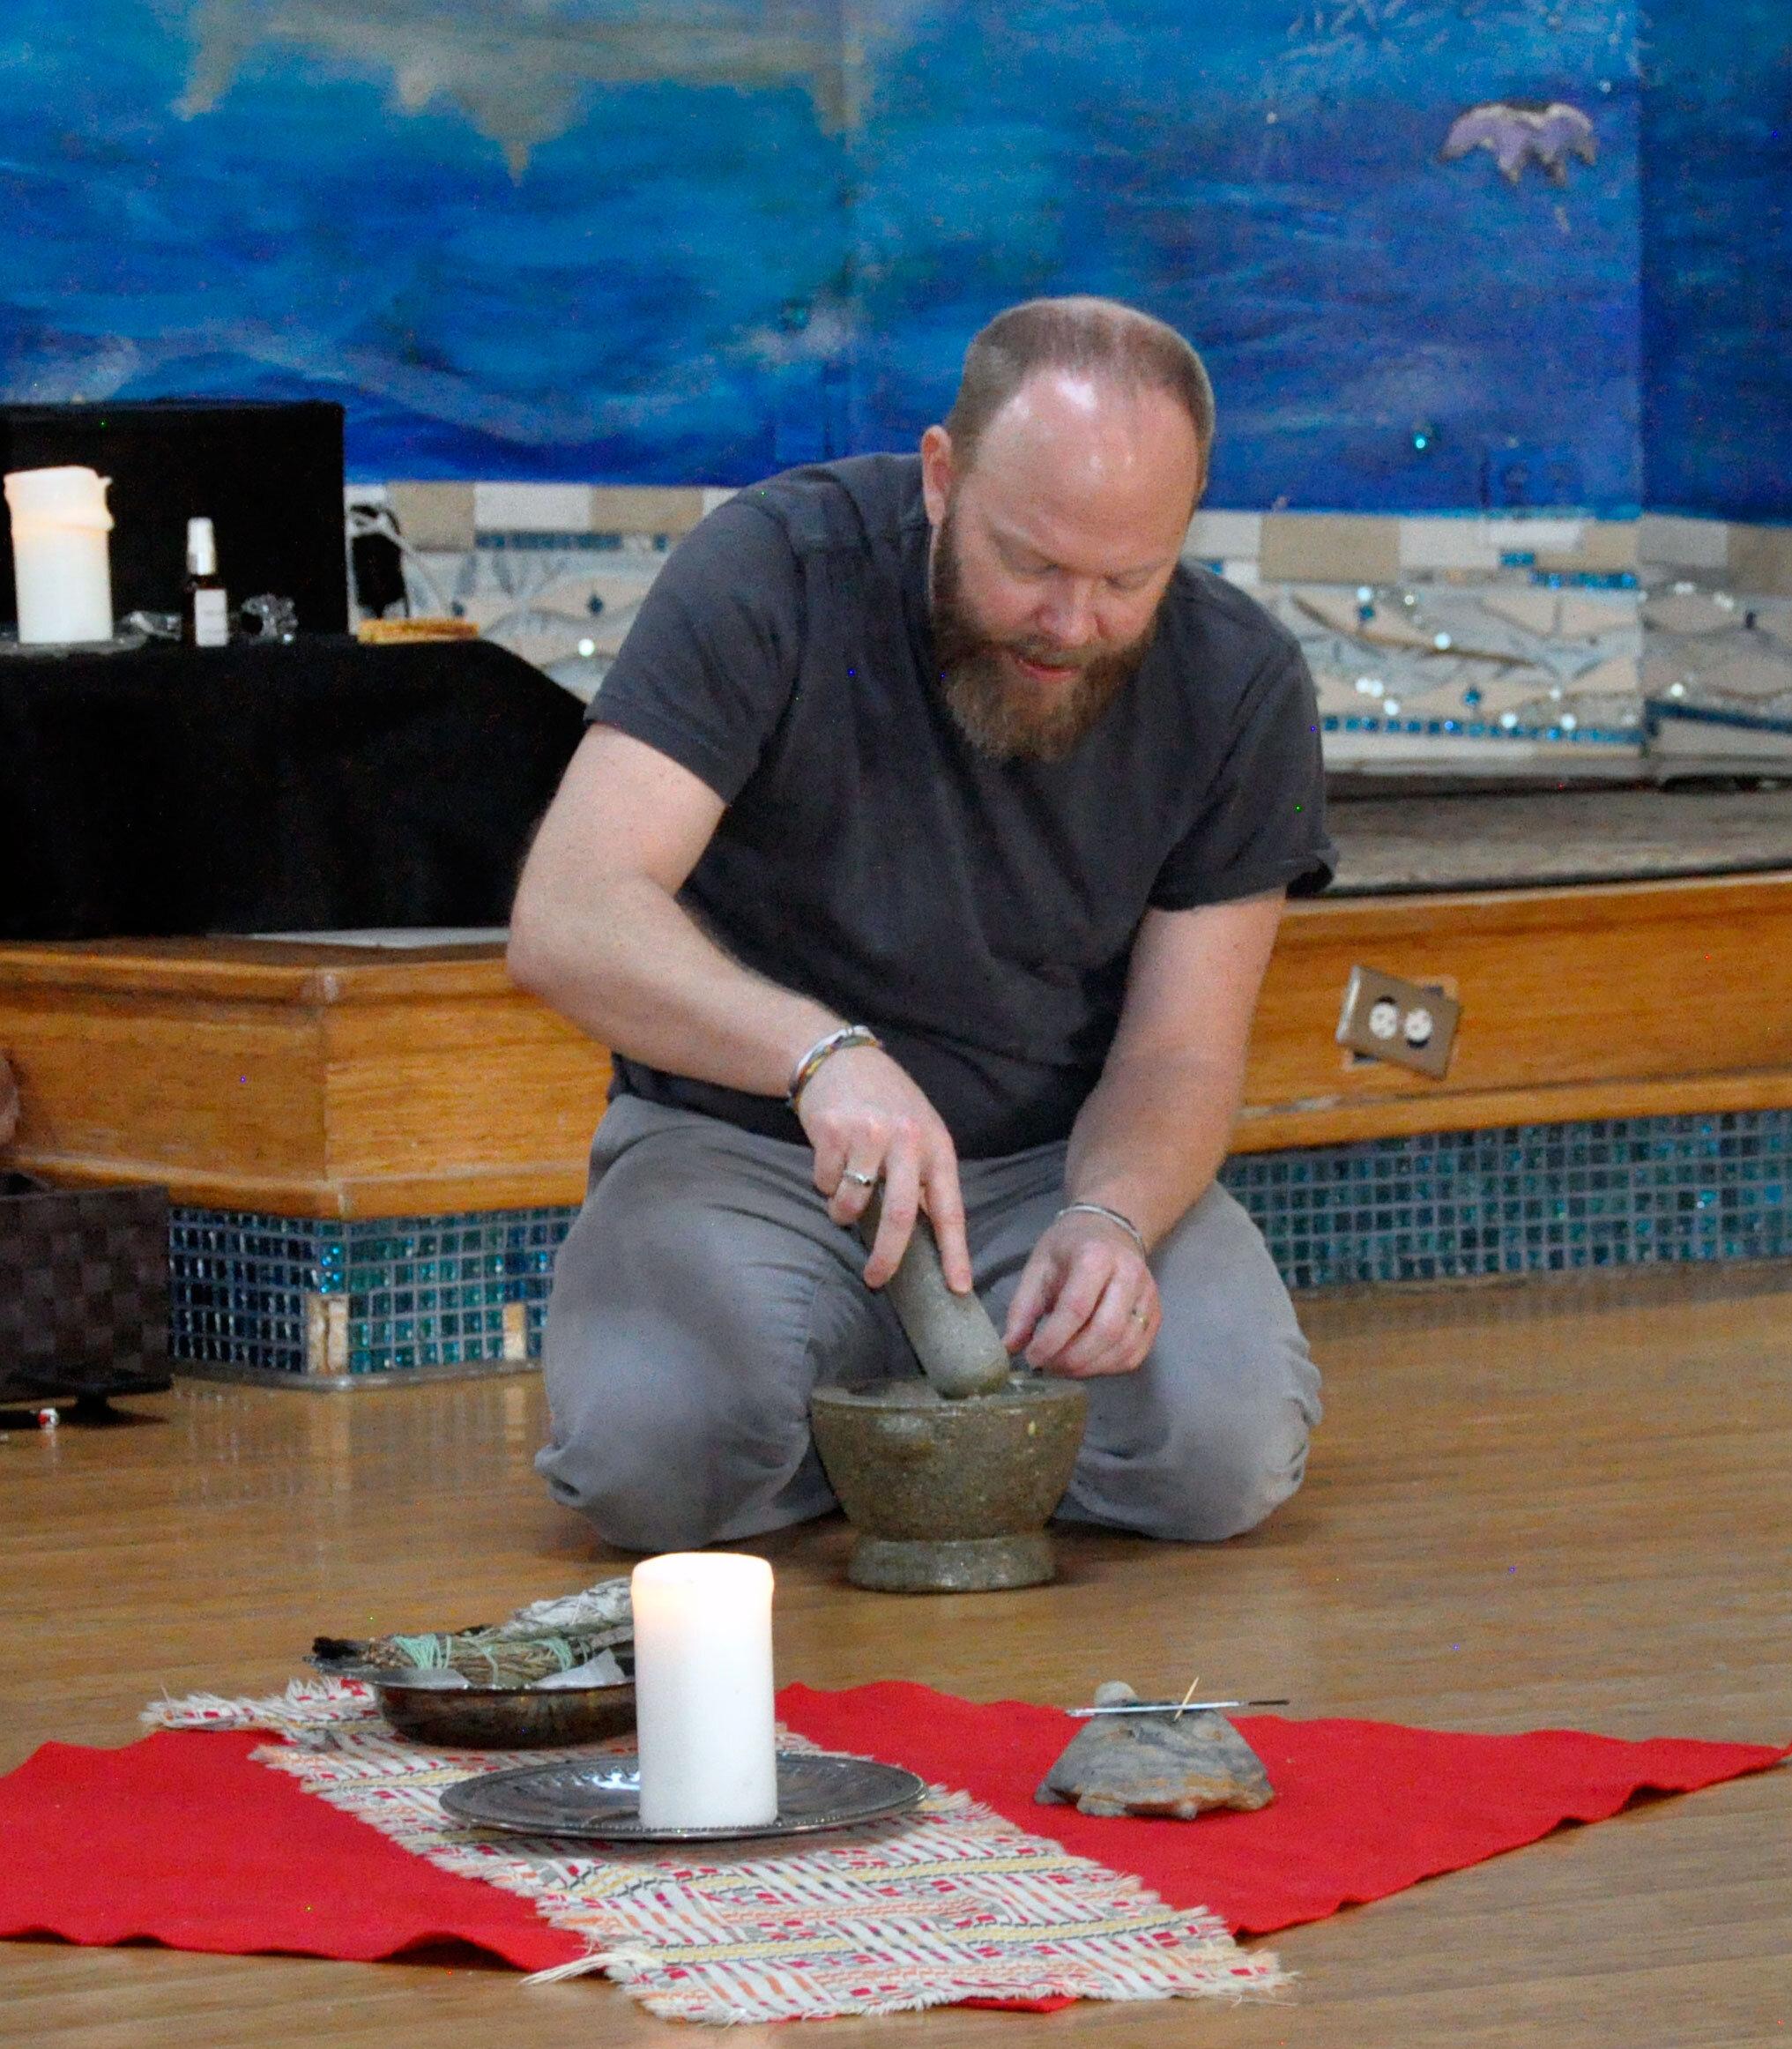 Daniel-blending-cannabis-making-many-spirits-one.jpg